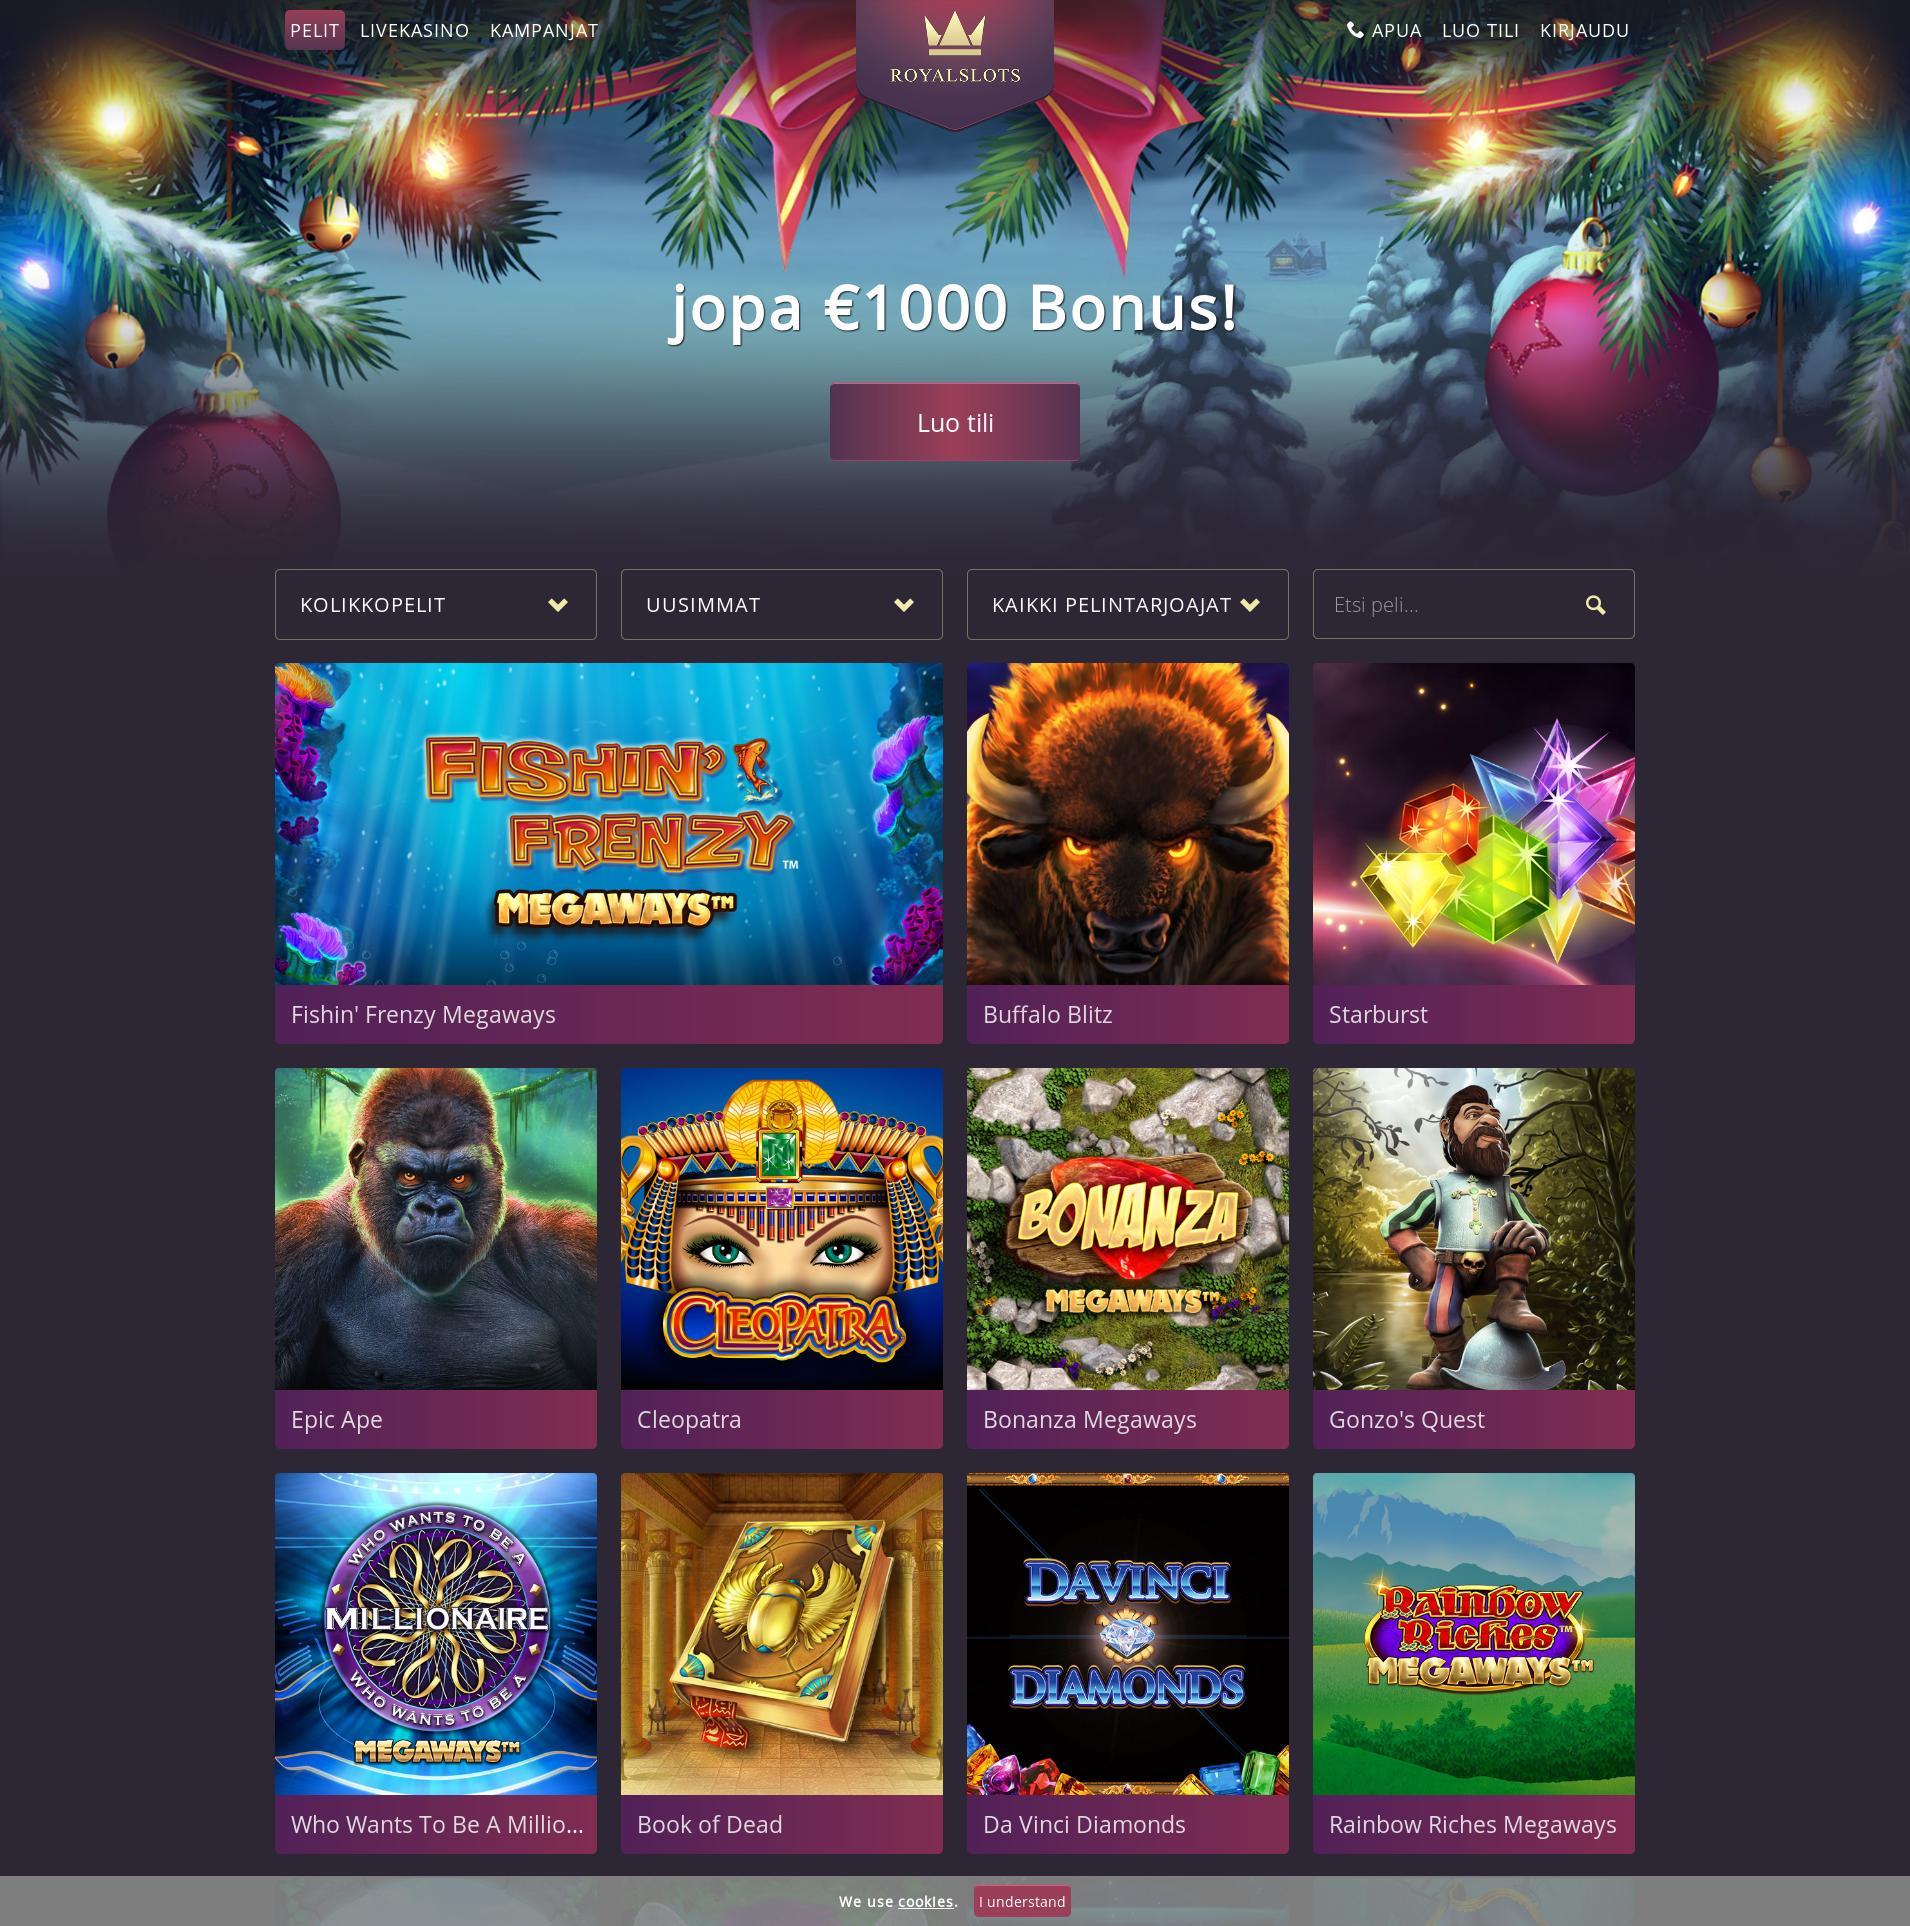 Casino screen Lobby 2019-12-05 for Finland